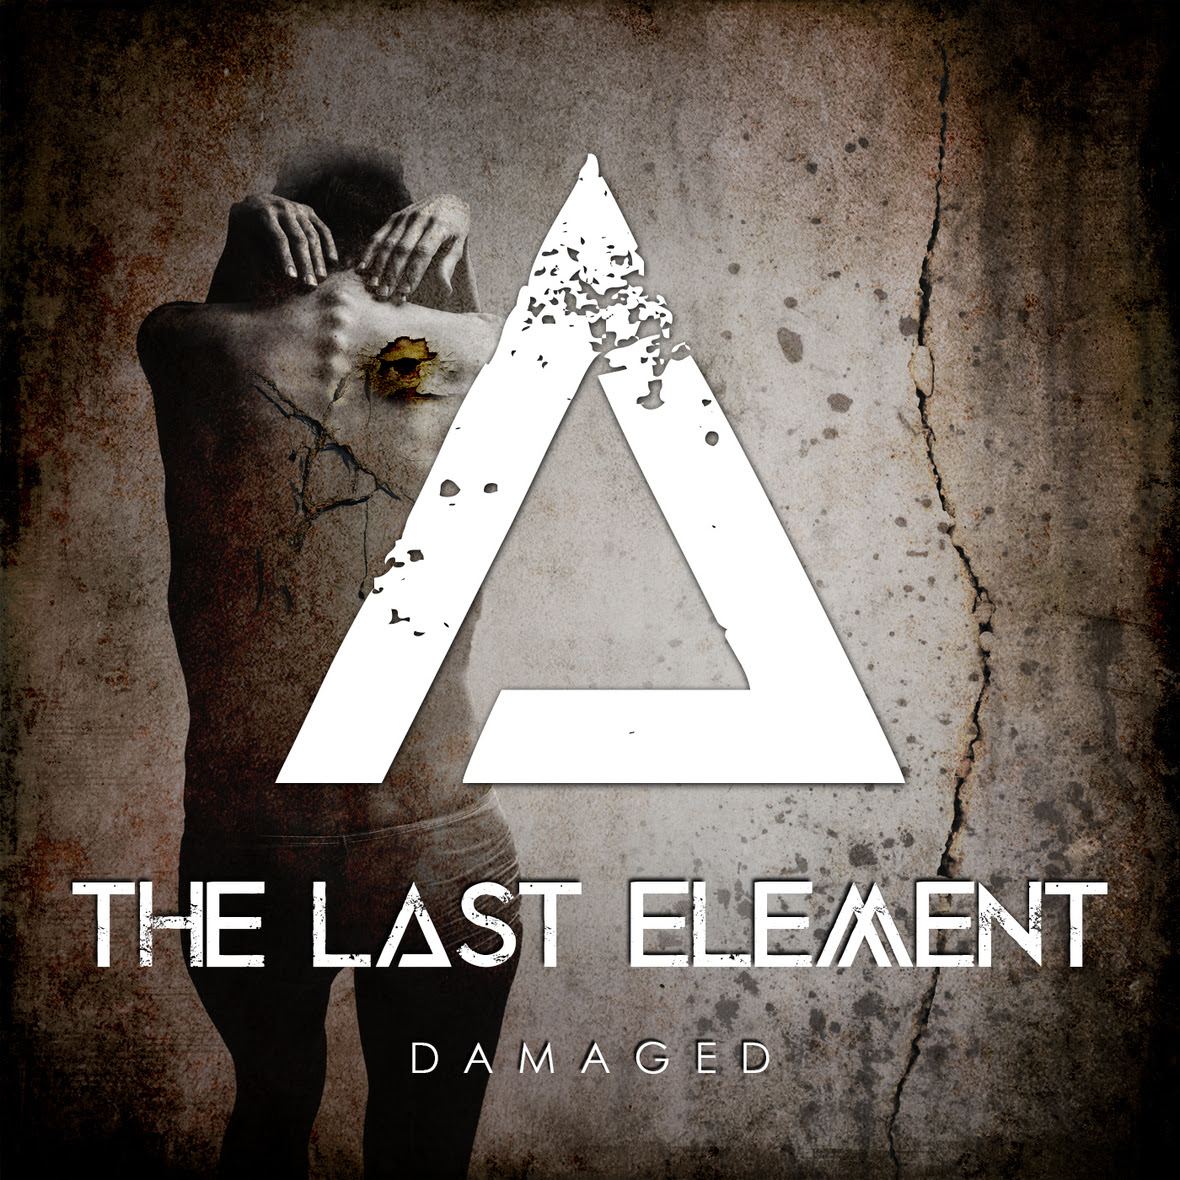 The Last Element - Damaged